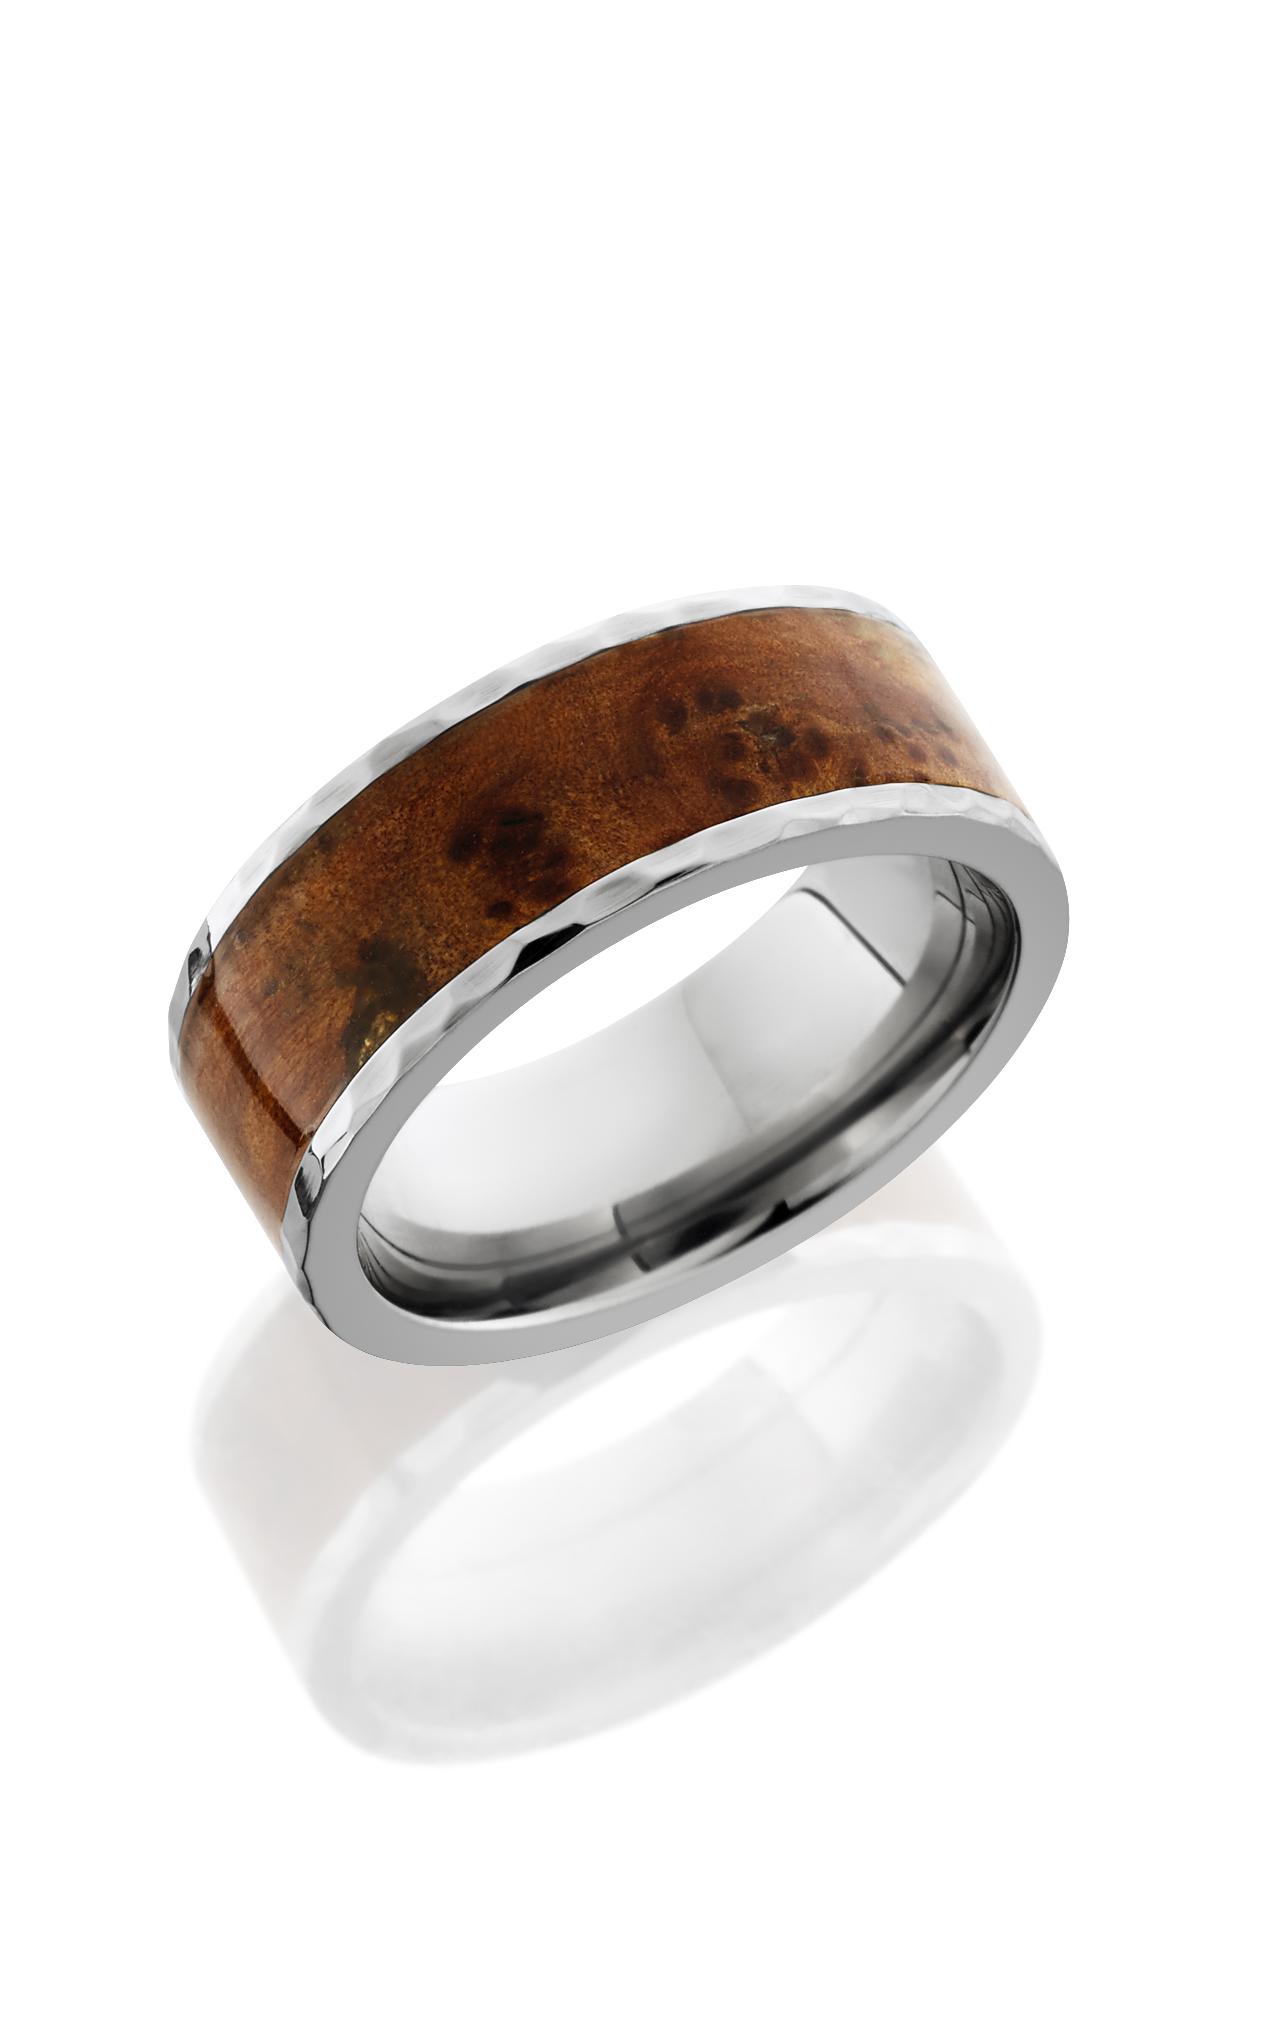 Lashbrook Hardwood Collection Wedding band 90115 product image